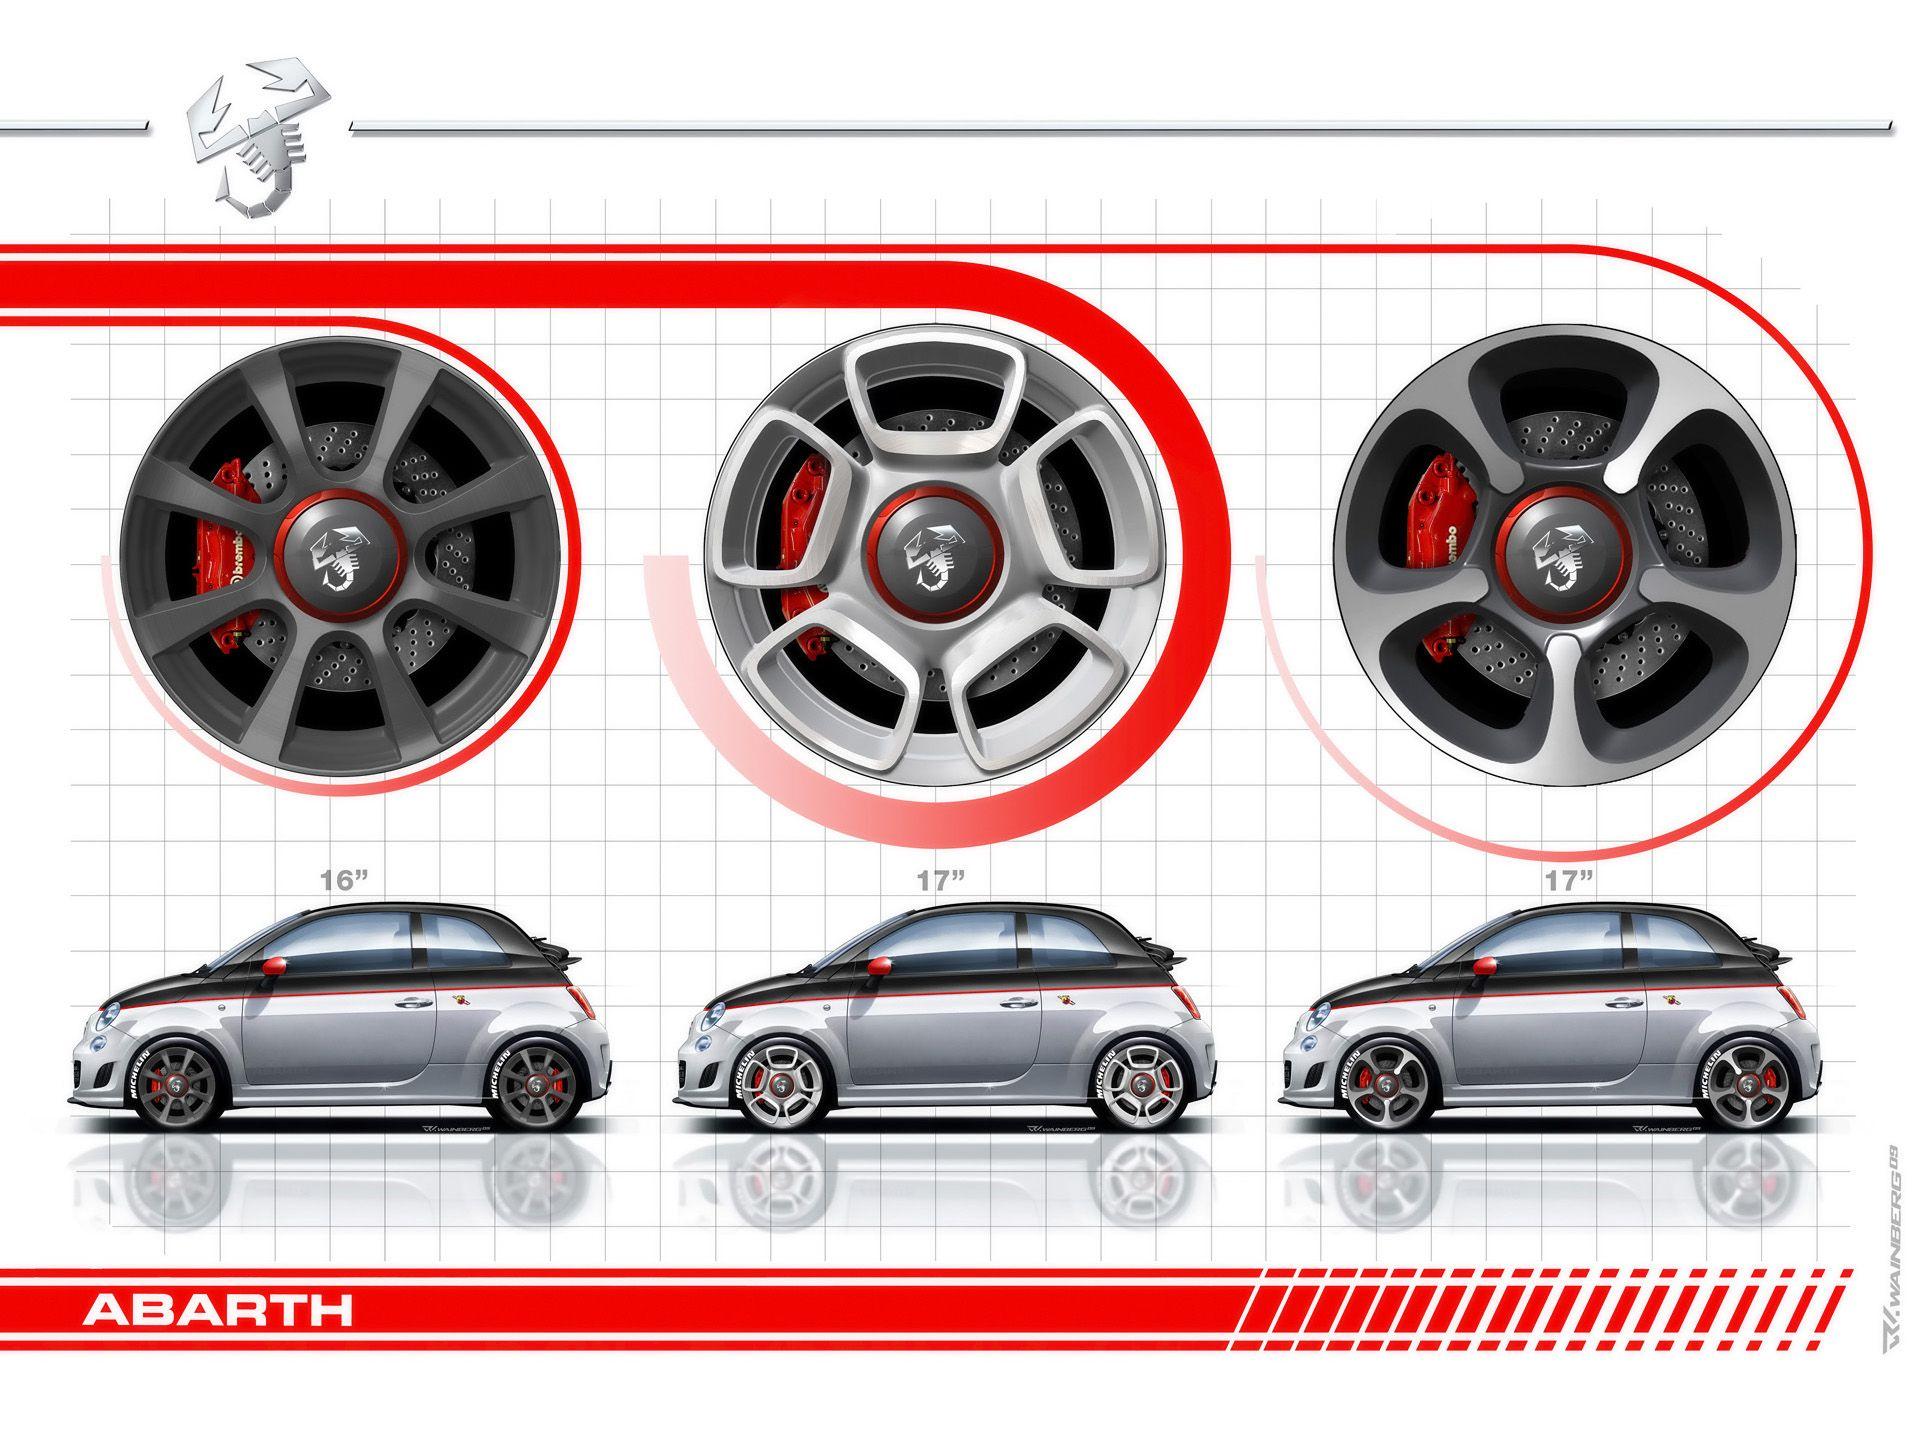 Fiat 500 Abarth Wheel Design Italian Transportation